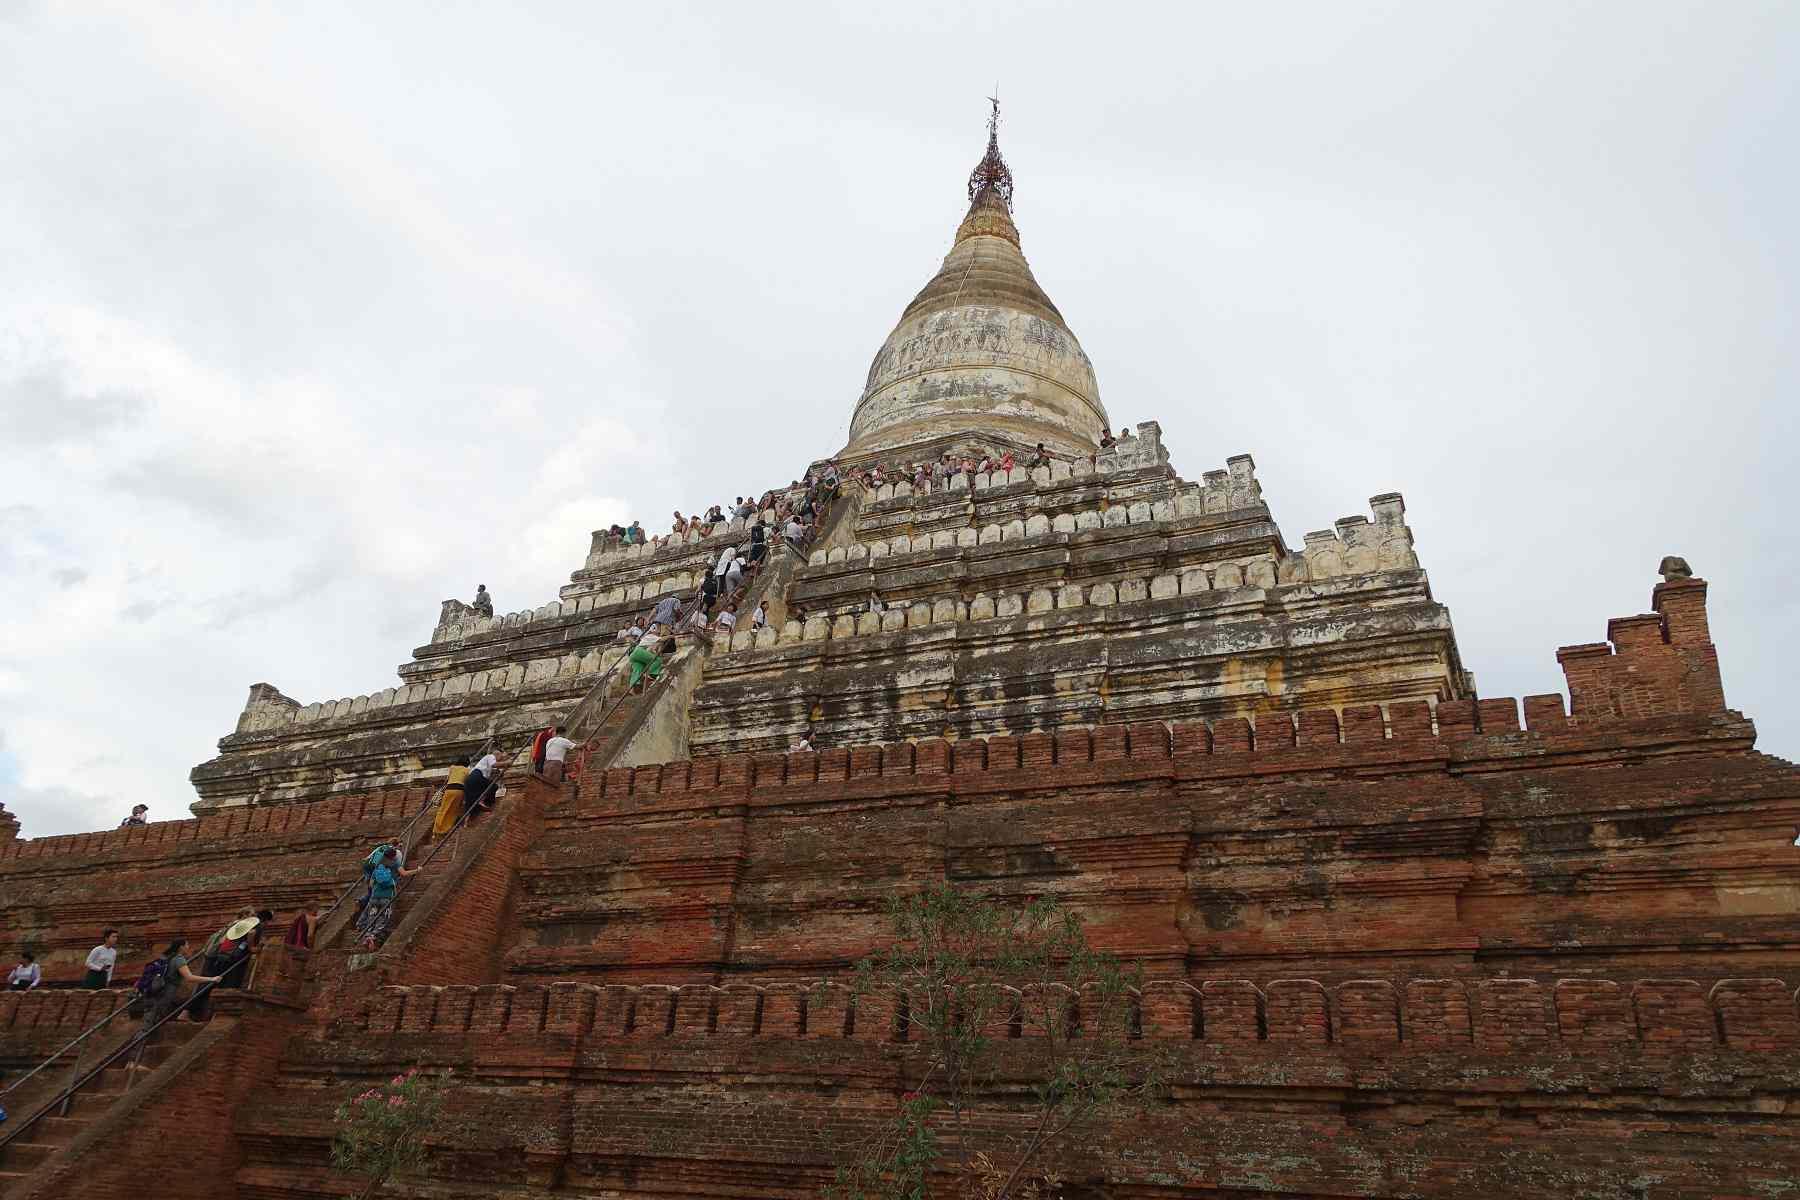 Exterior of Shwesandaw Temple, Bagan, Myanmar